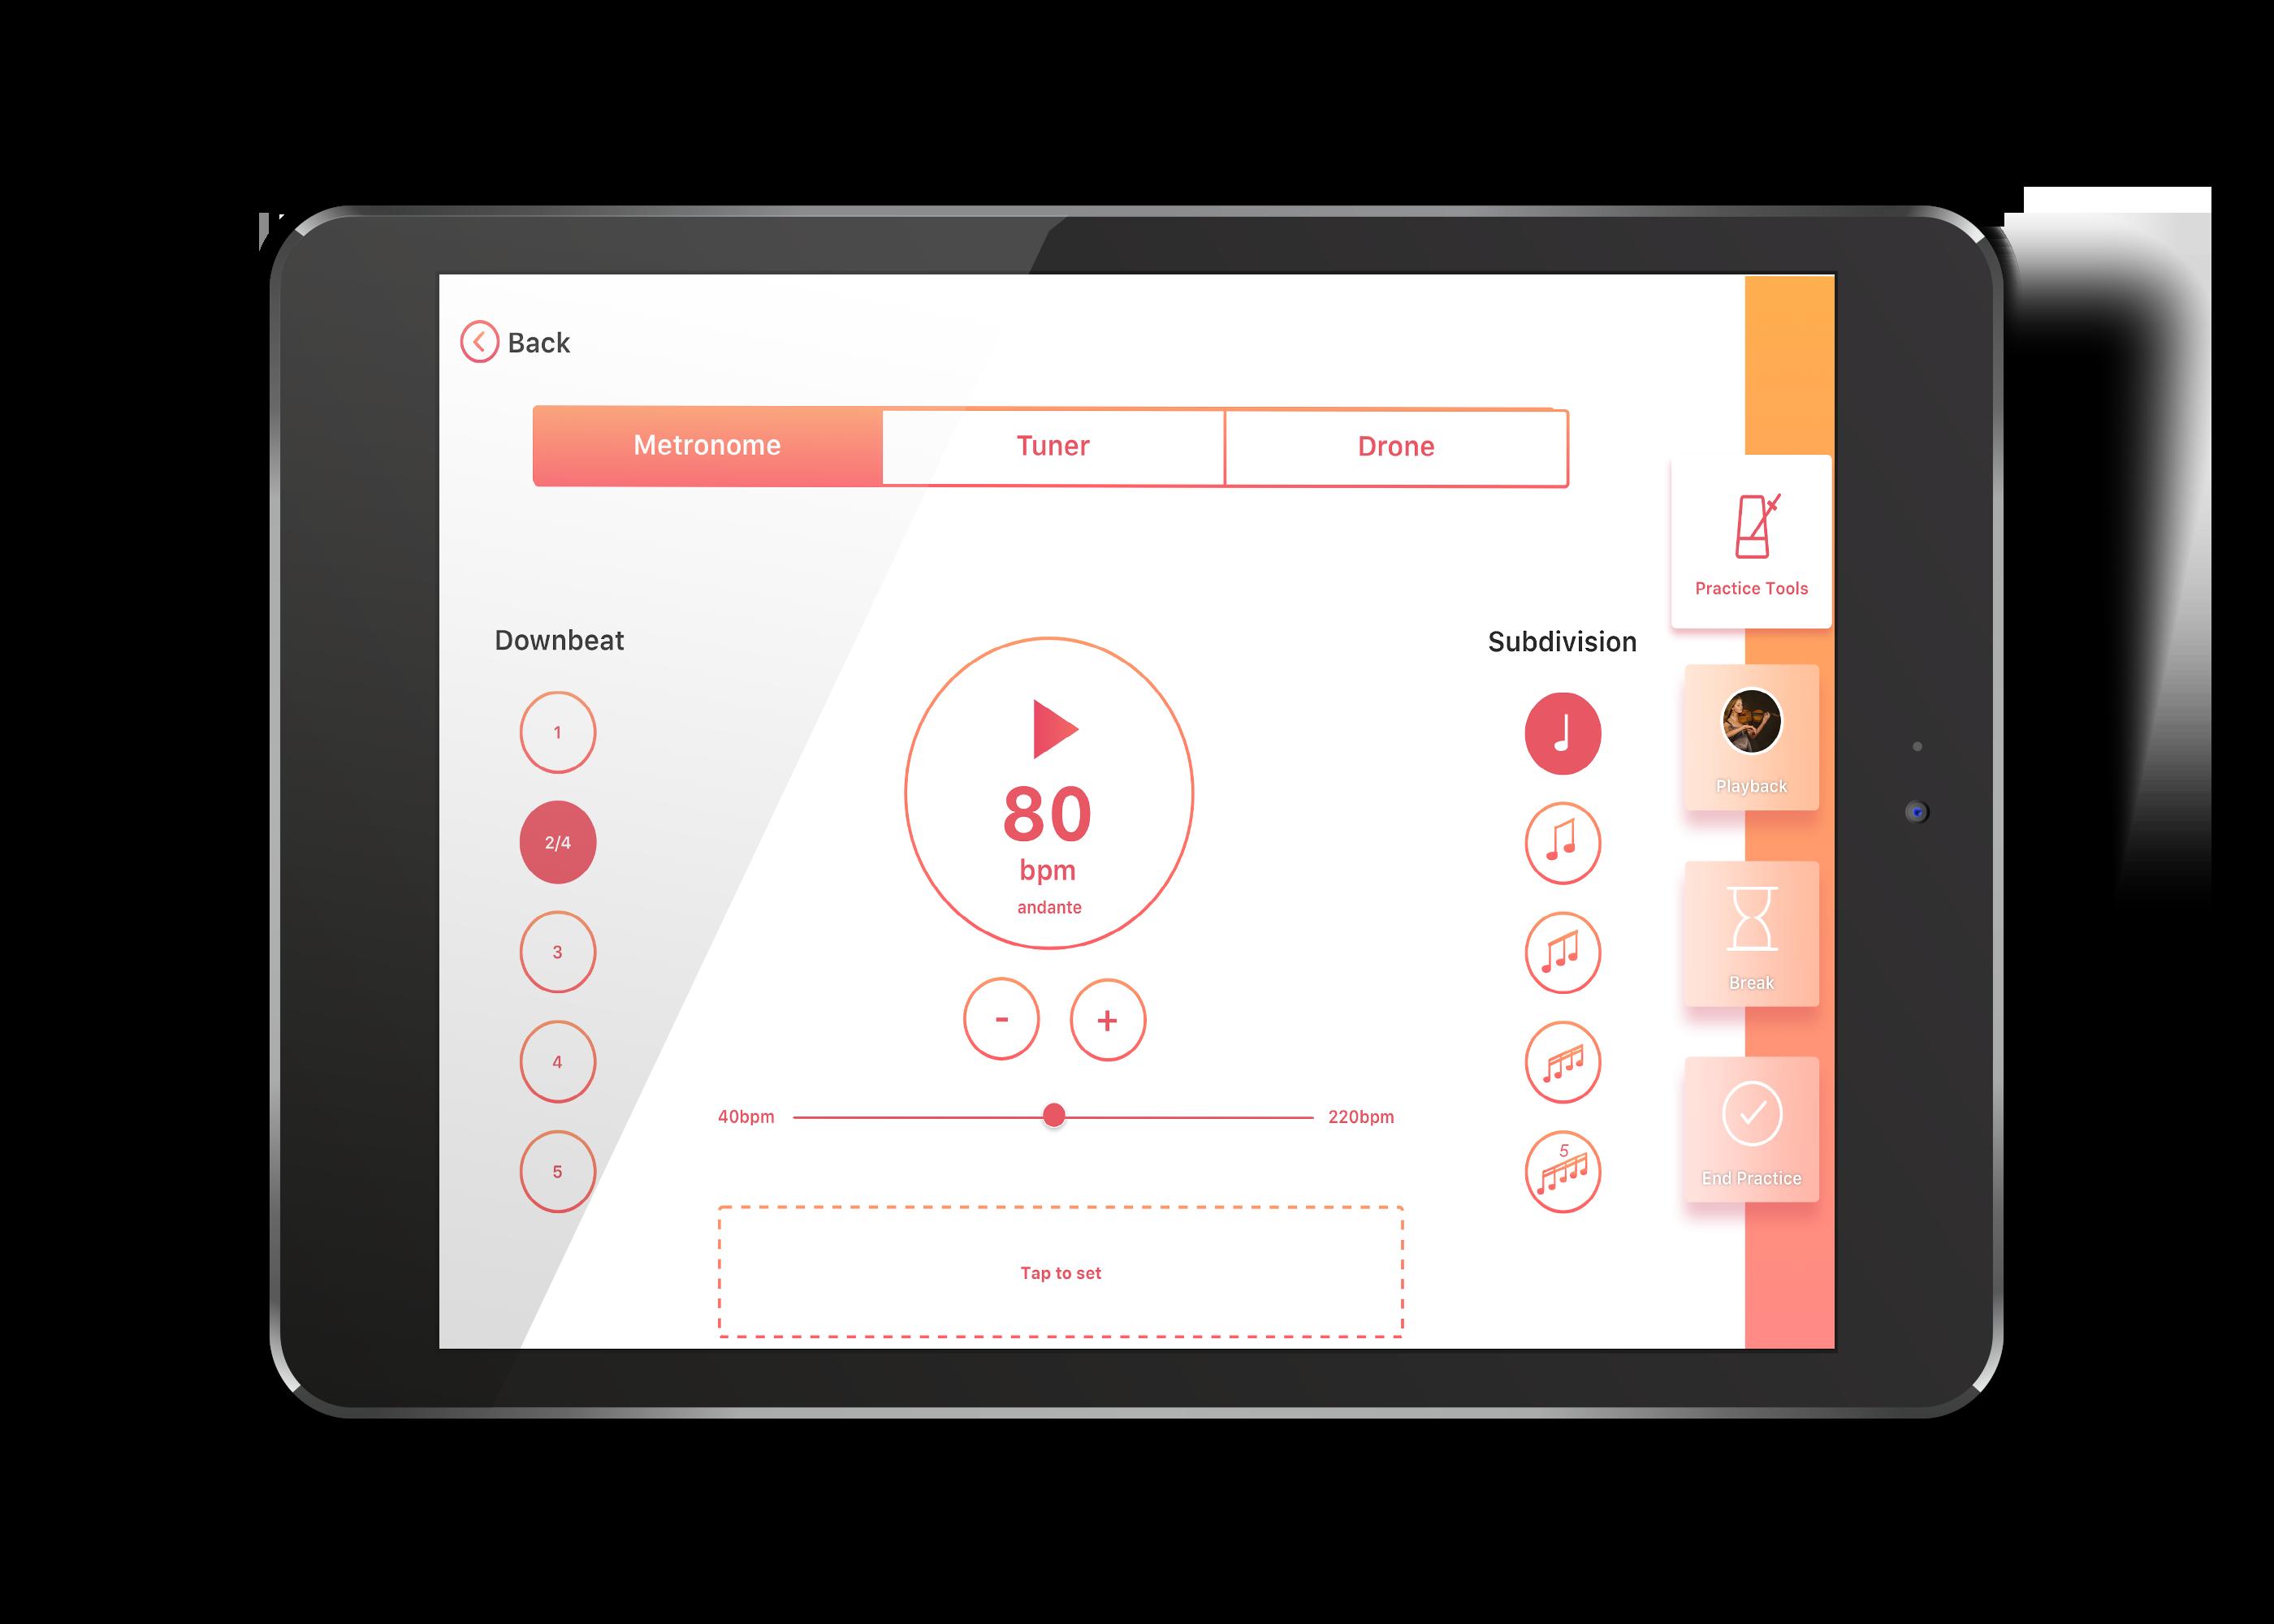 vcu brand loyalty app metronome